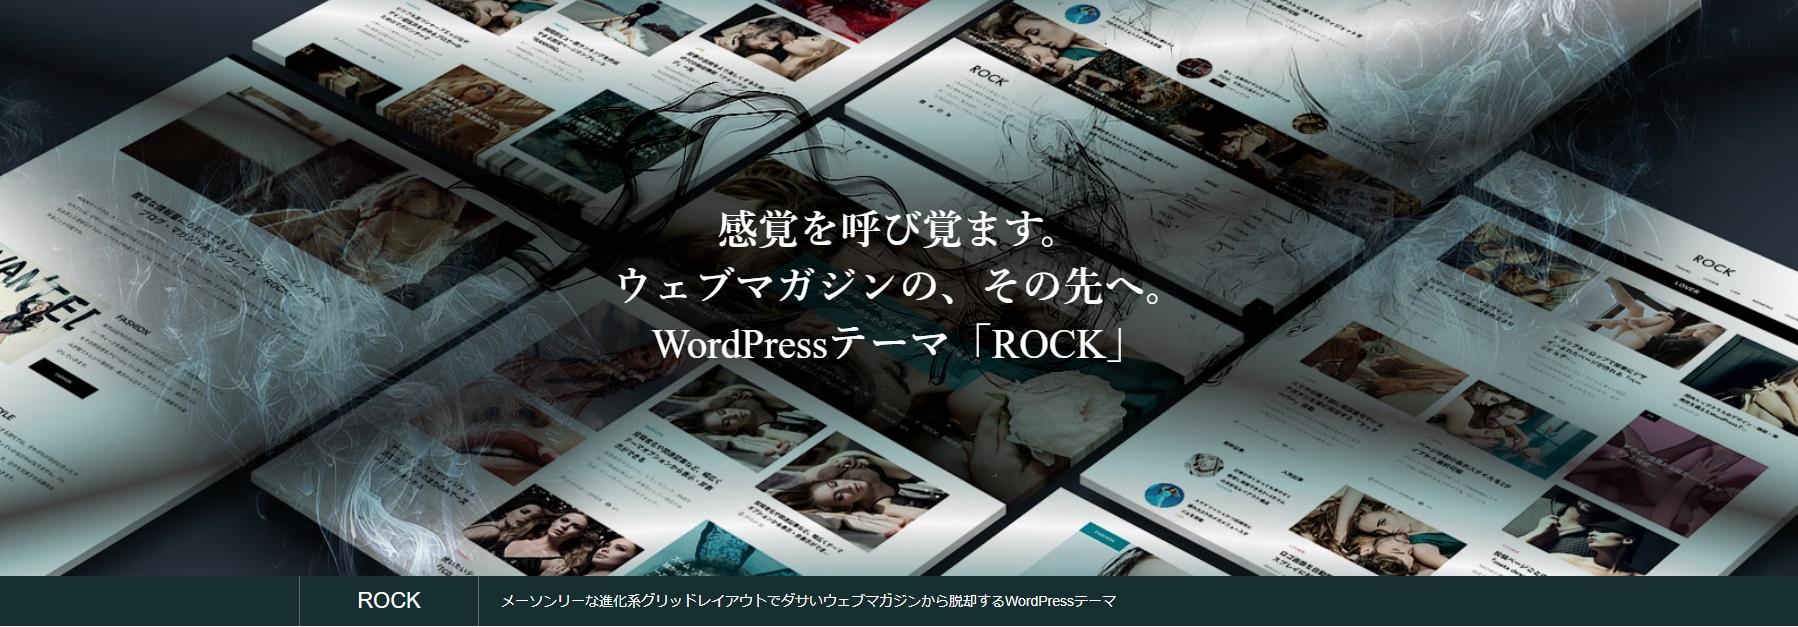 wordpress-theme-rock-tcd068